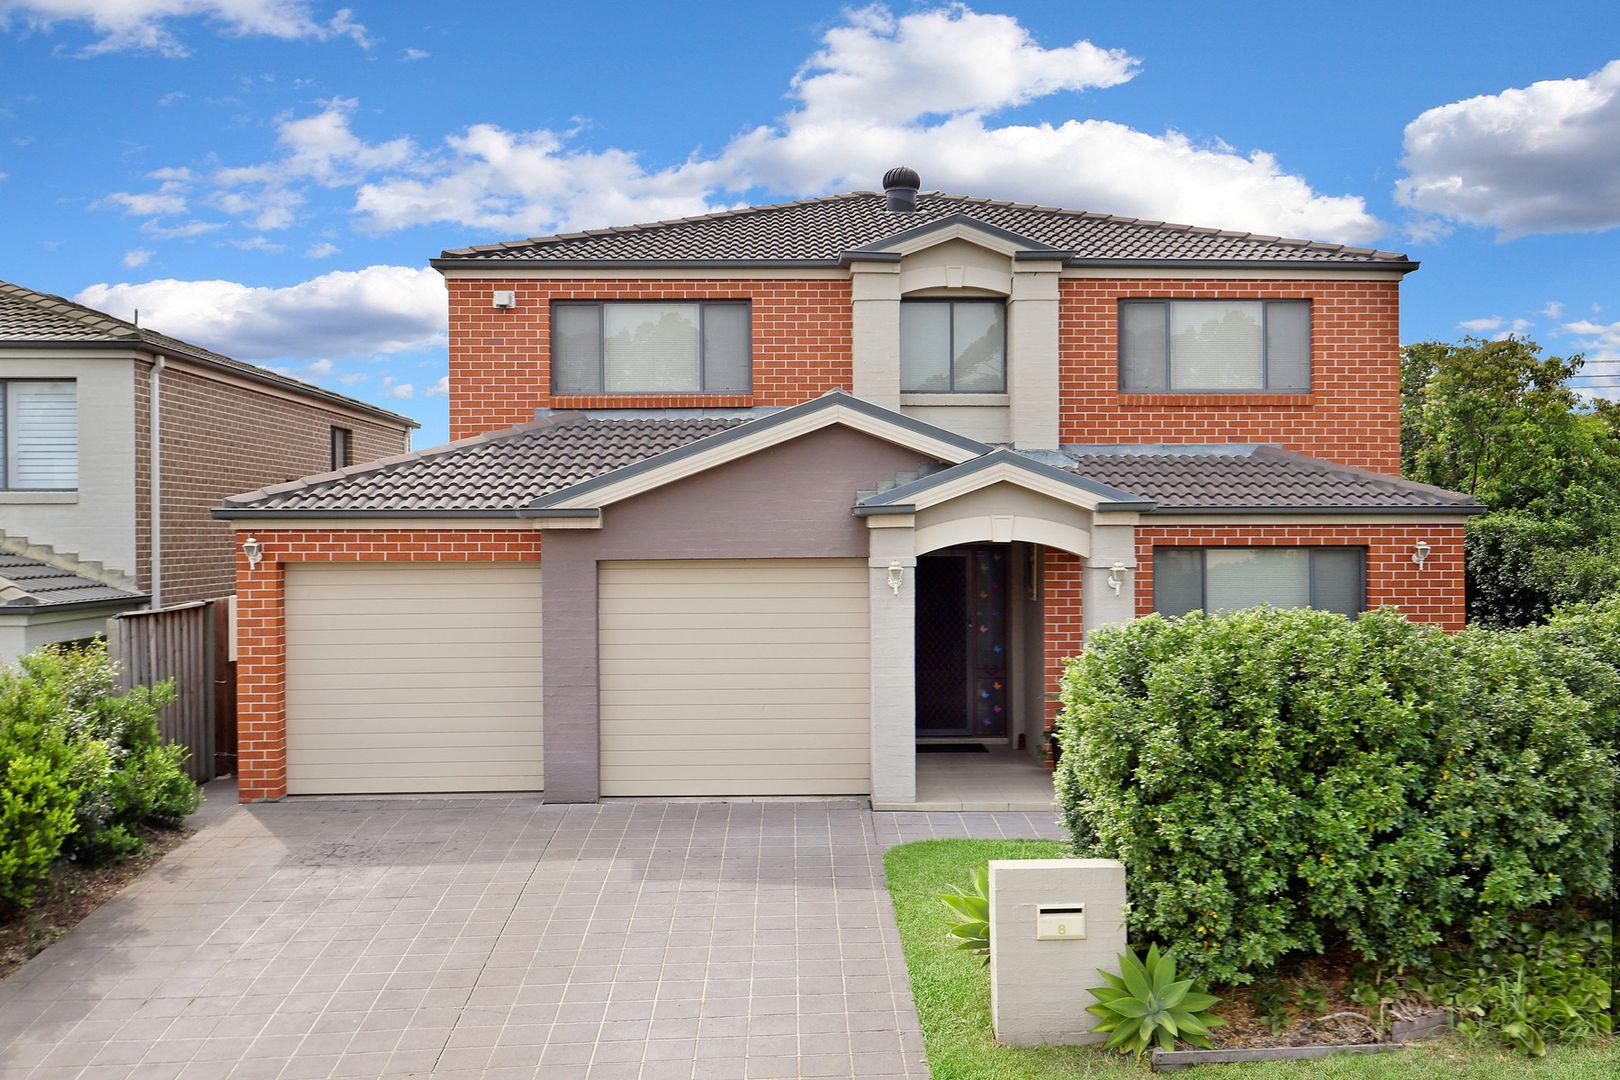 8 MAGENTO PLACE, Prestons NSW 2170, Image 0